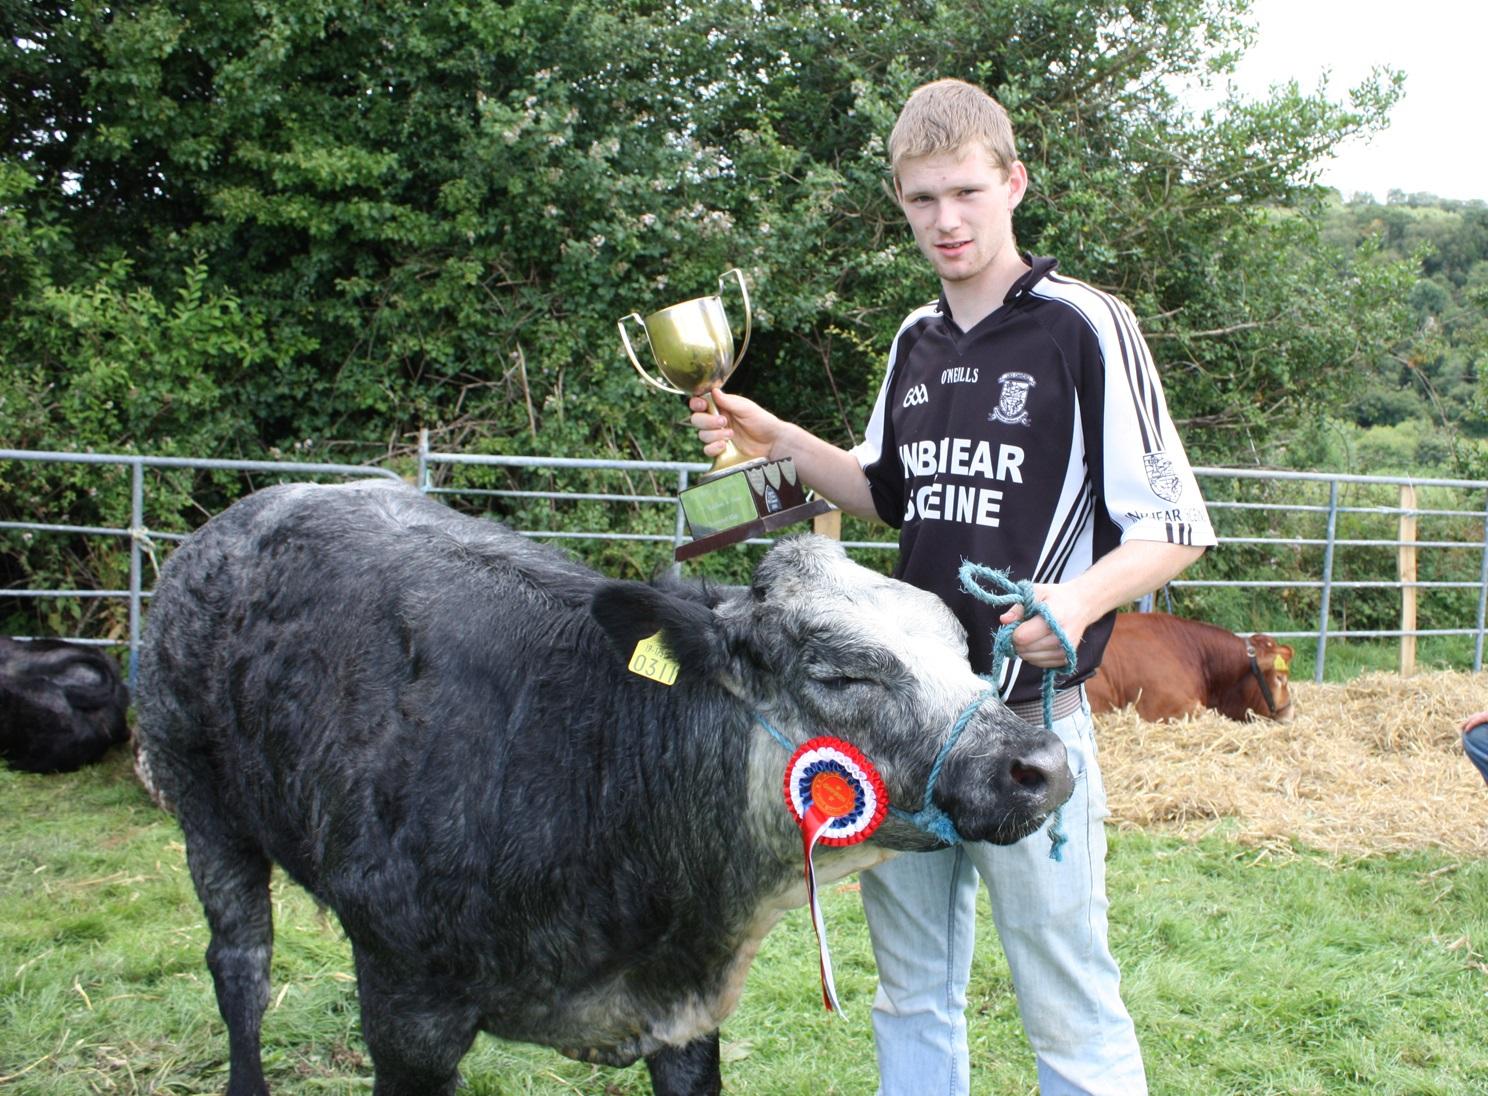 Beef Breed Championship